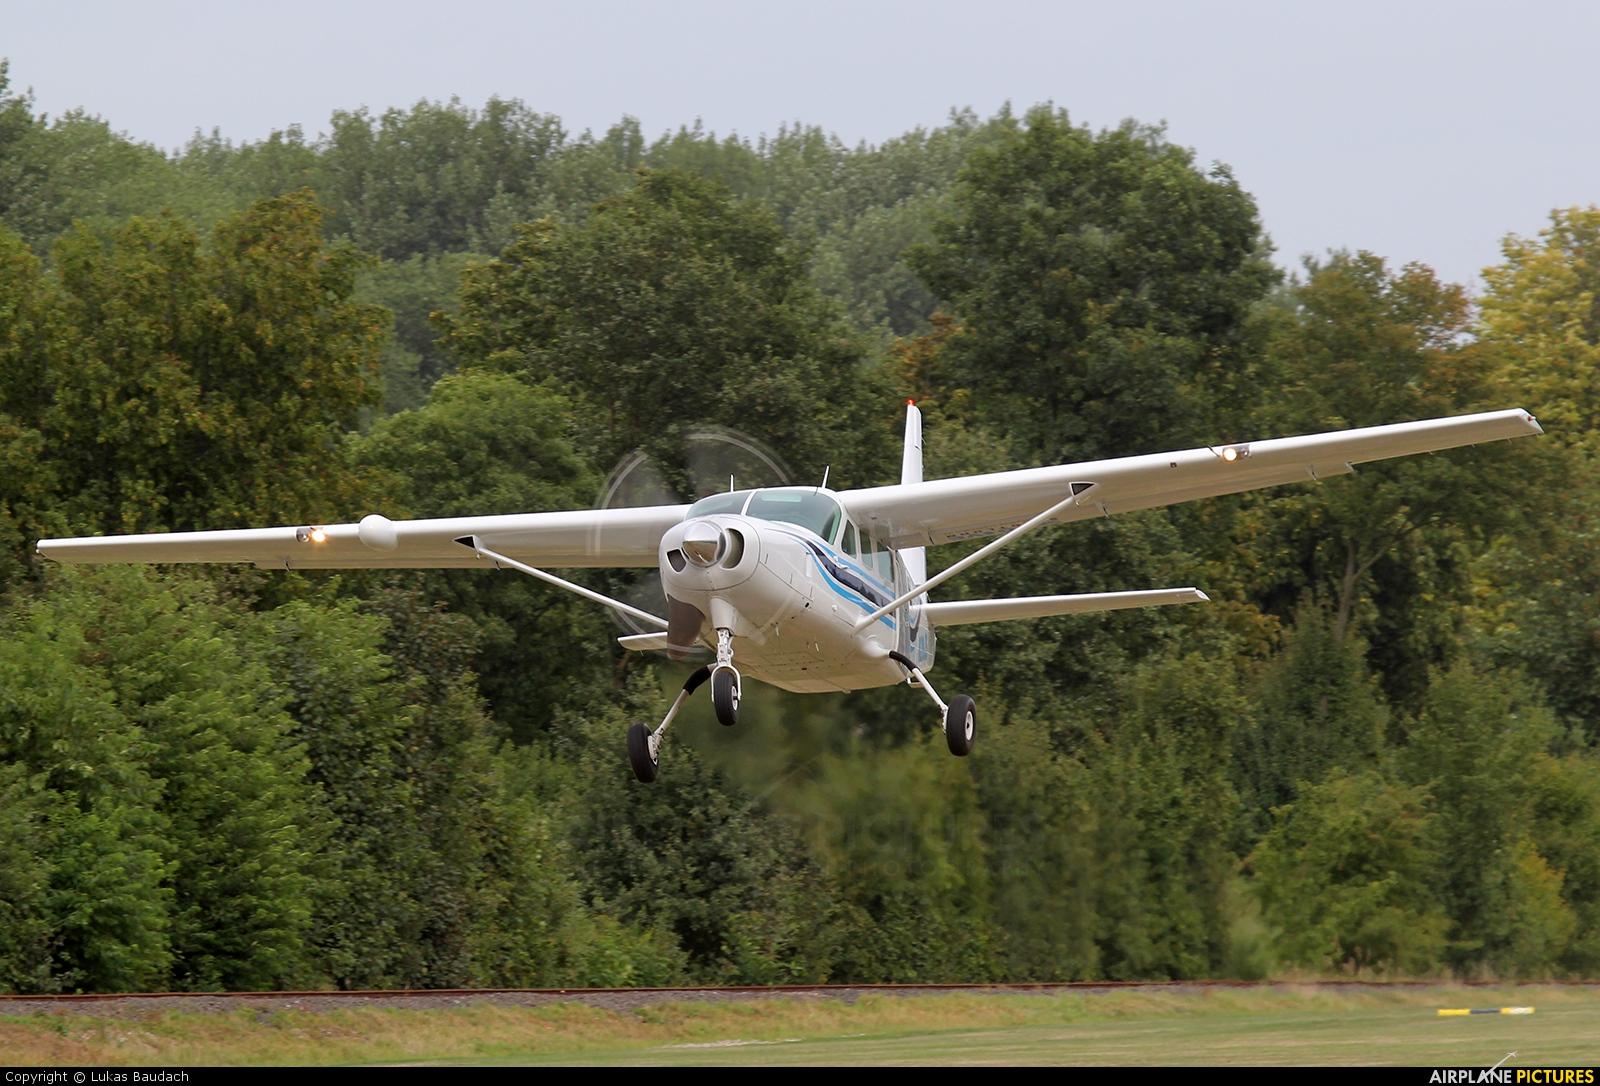 N209JA - Skydive Stadtlohn Cessna 208 Caravan at Marl